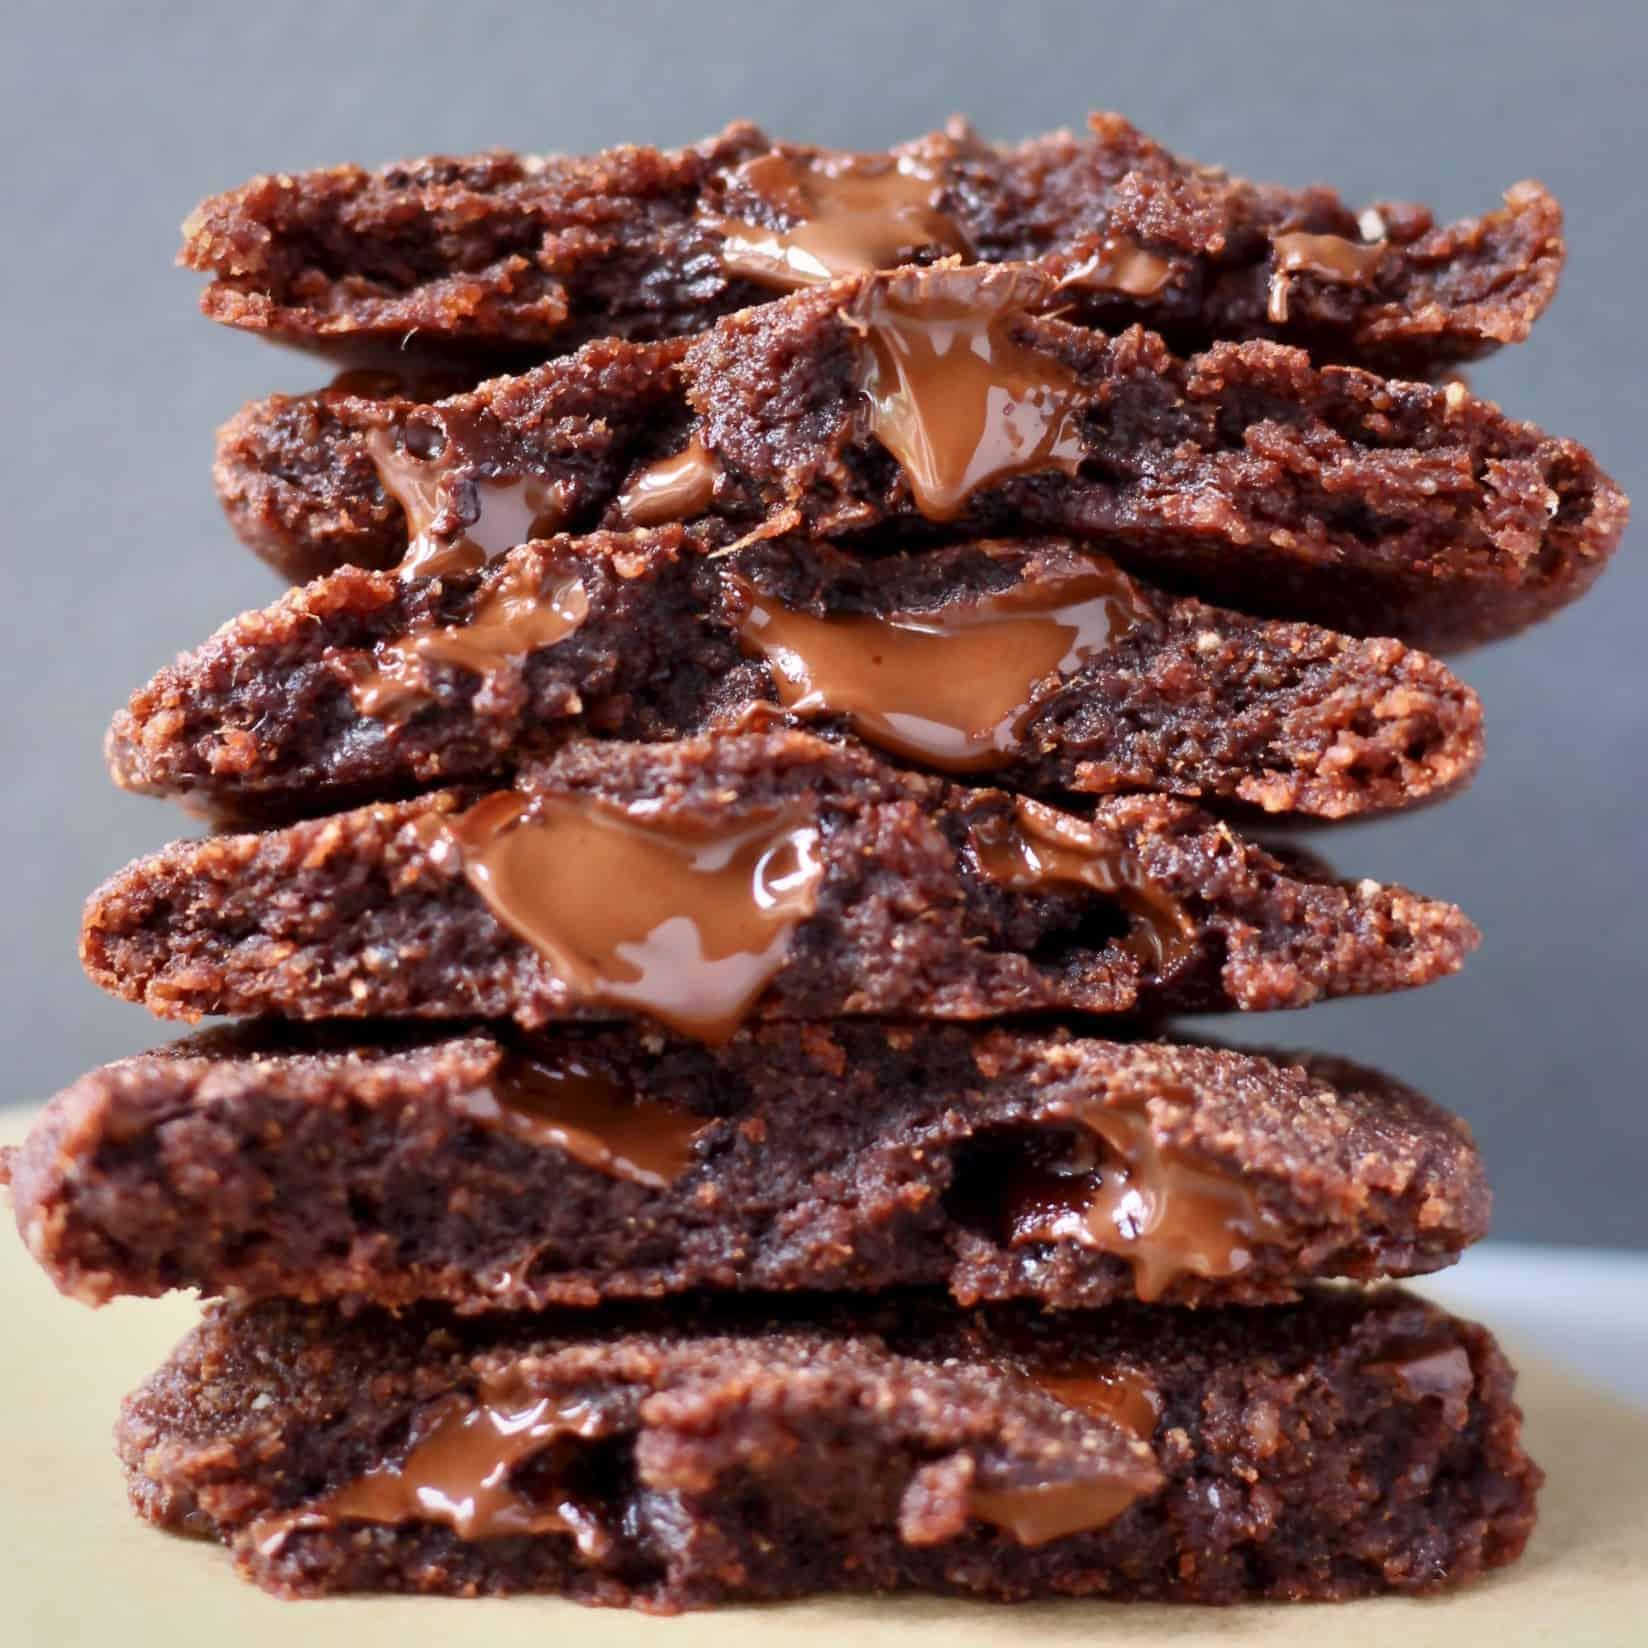 Gluten-Free Vegan Chocolate Cookies